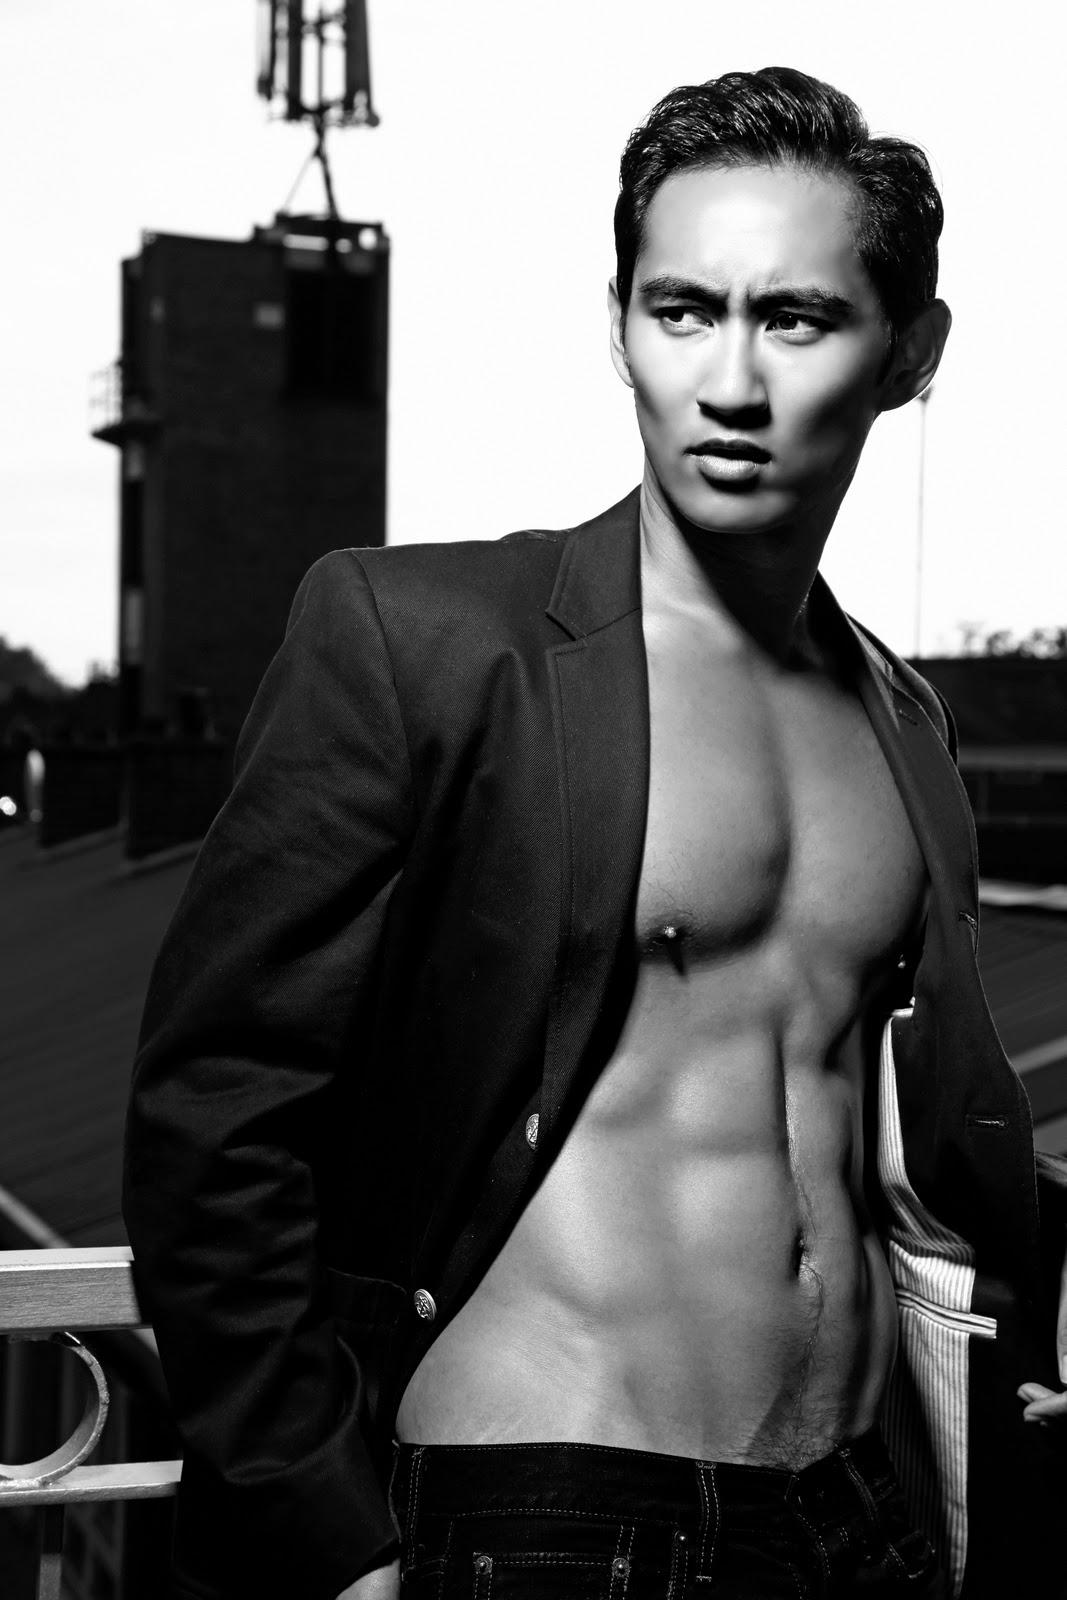 2011 - 2012 | Manhunt - Mister International - Mister Universe Model | Hawaii - USA | Rhonee Rojas Rhonee_06web